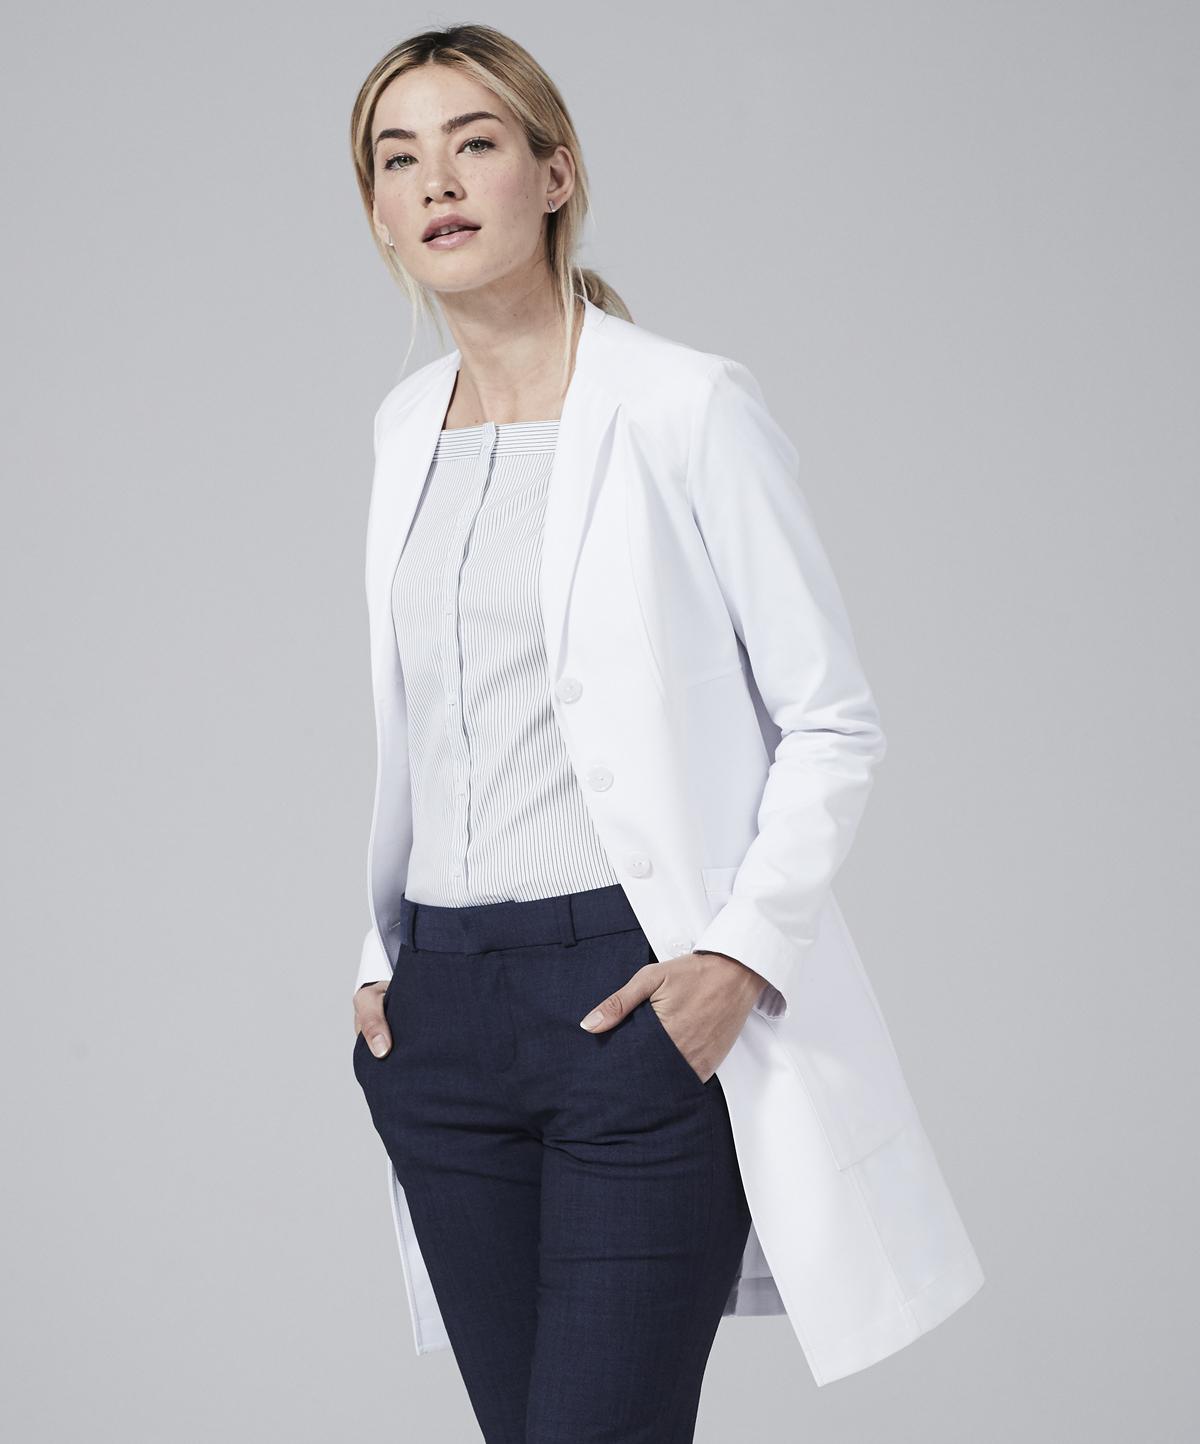 2b7a35348ca vera slim fit lab coat for women